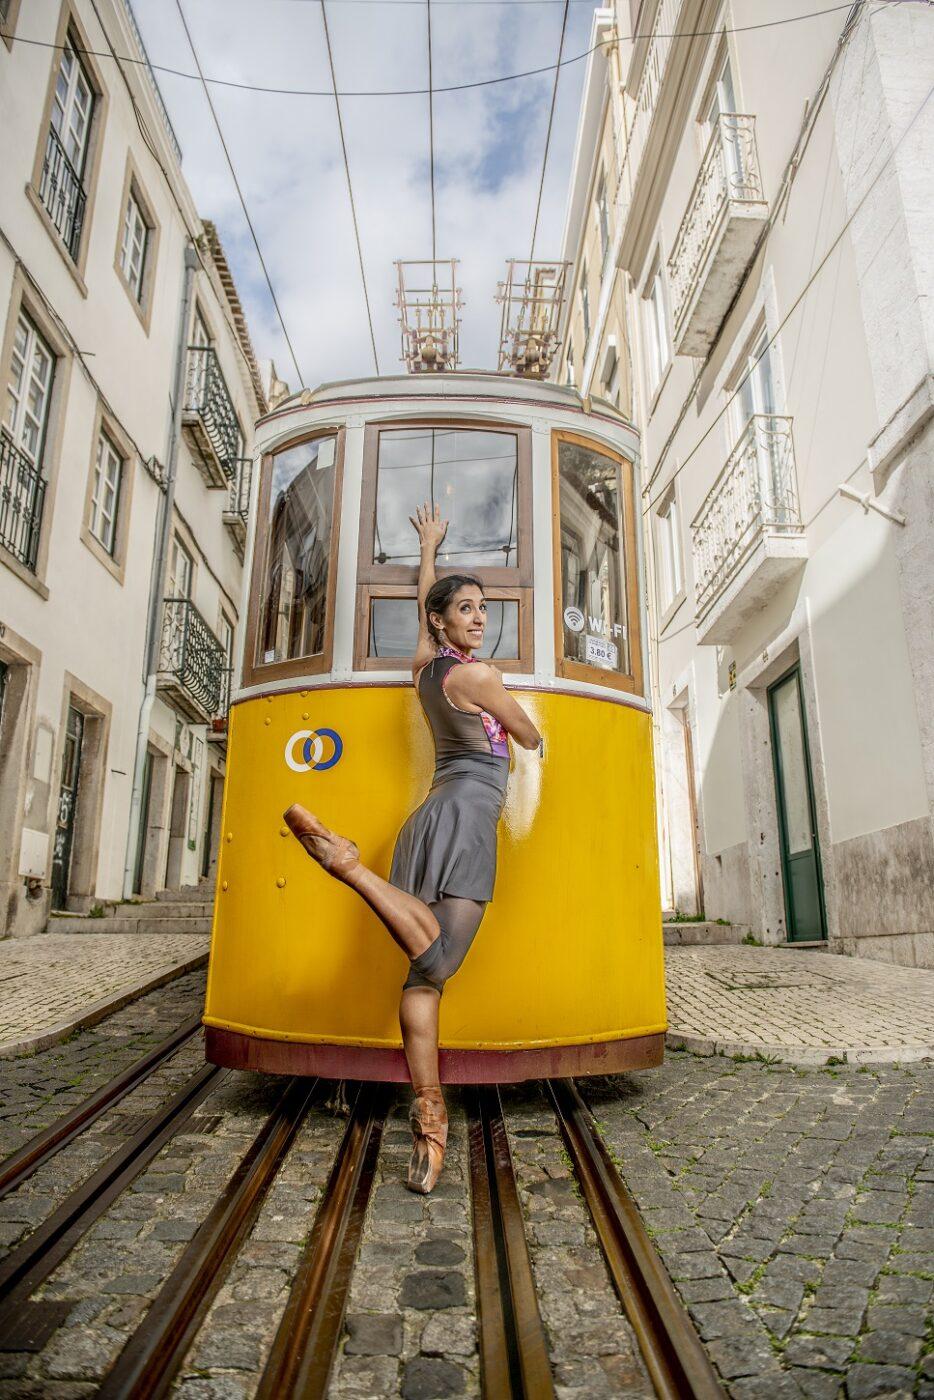 Irina de Oliveira